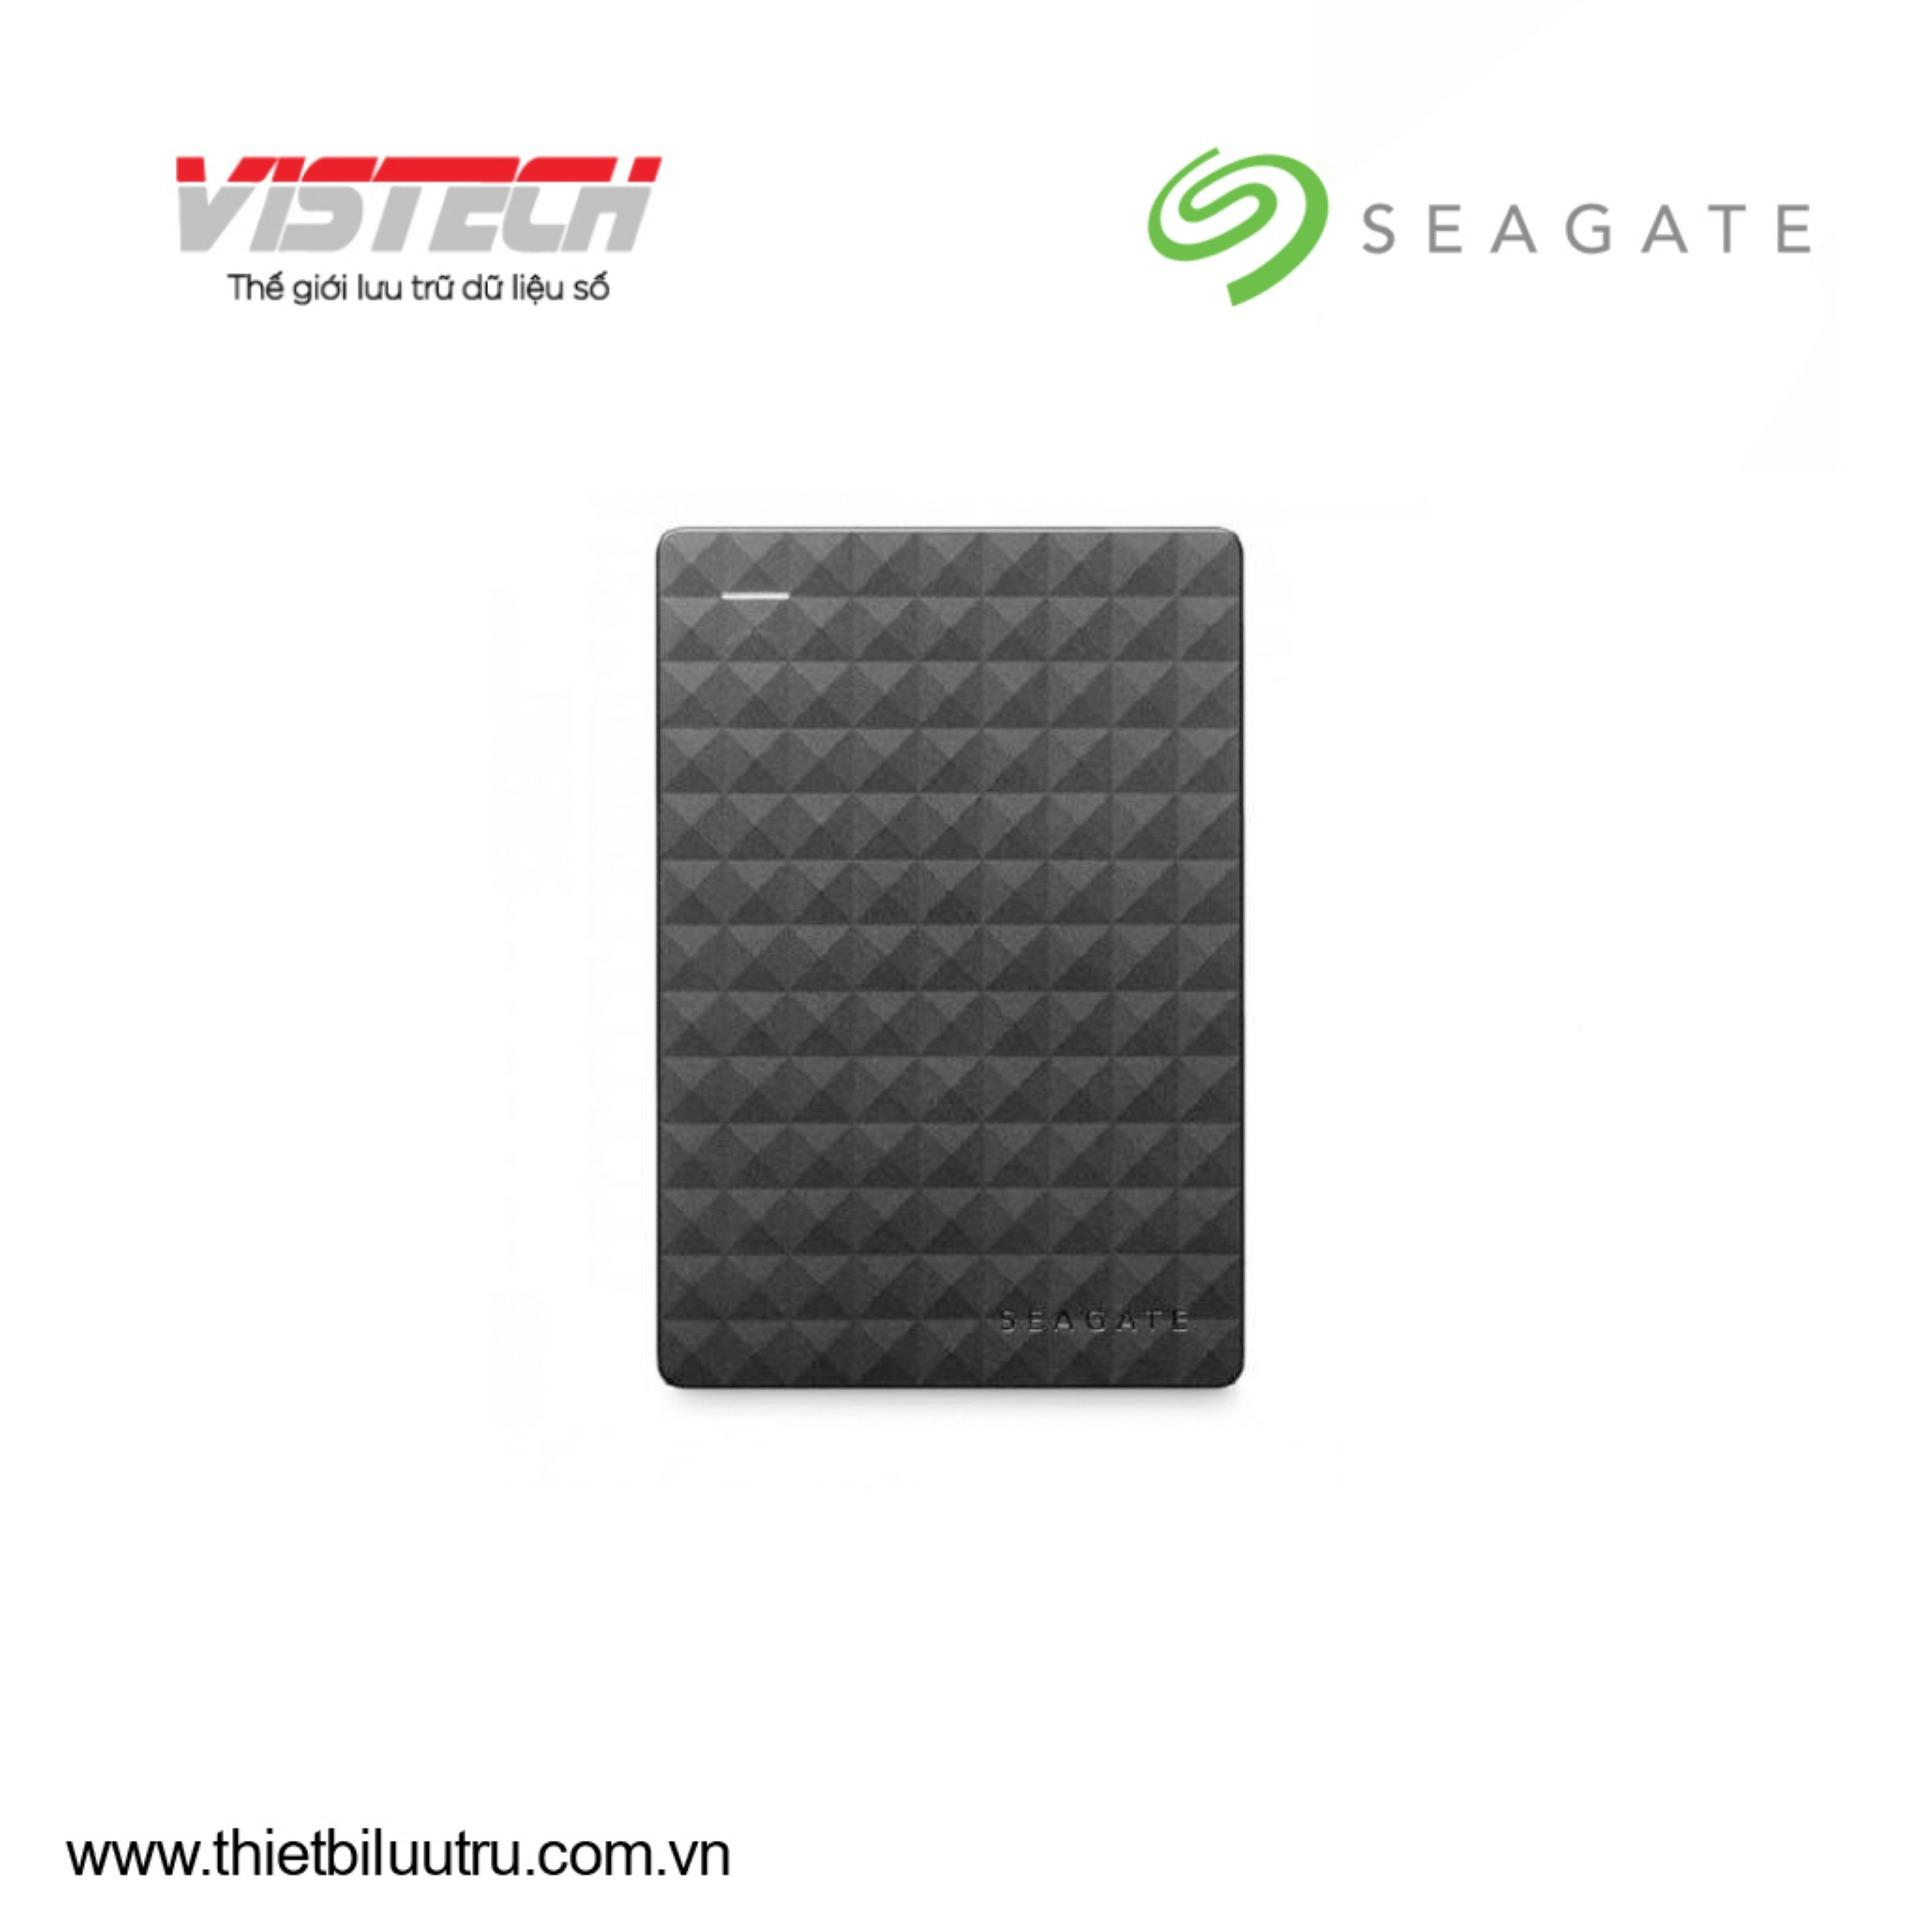 Ổ cứng di động Seagate Expansion New 2TB 2.5